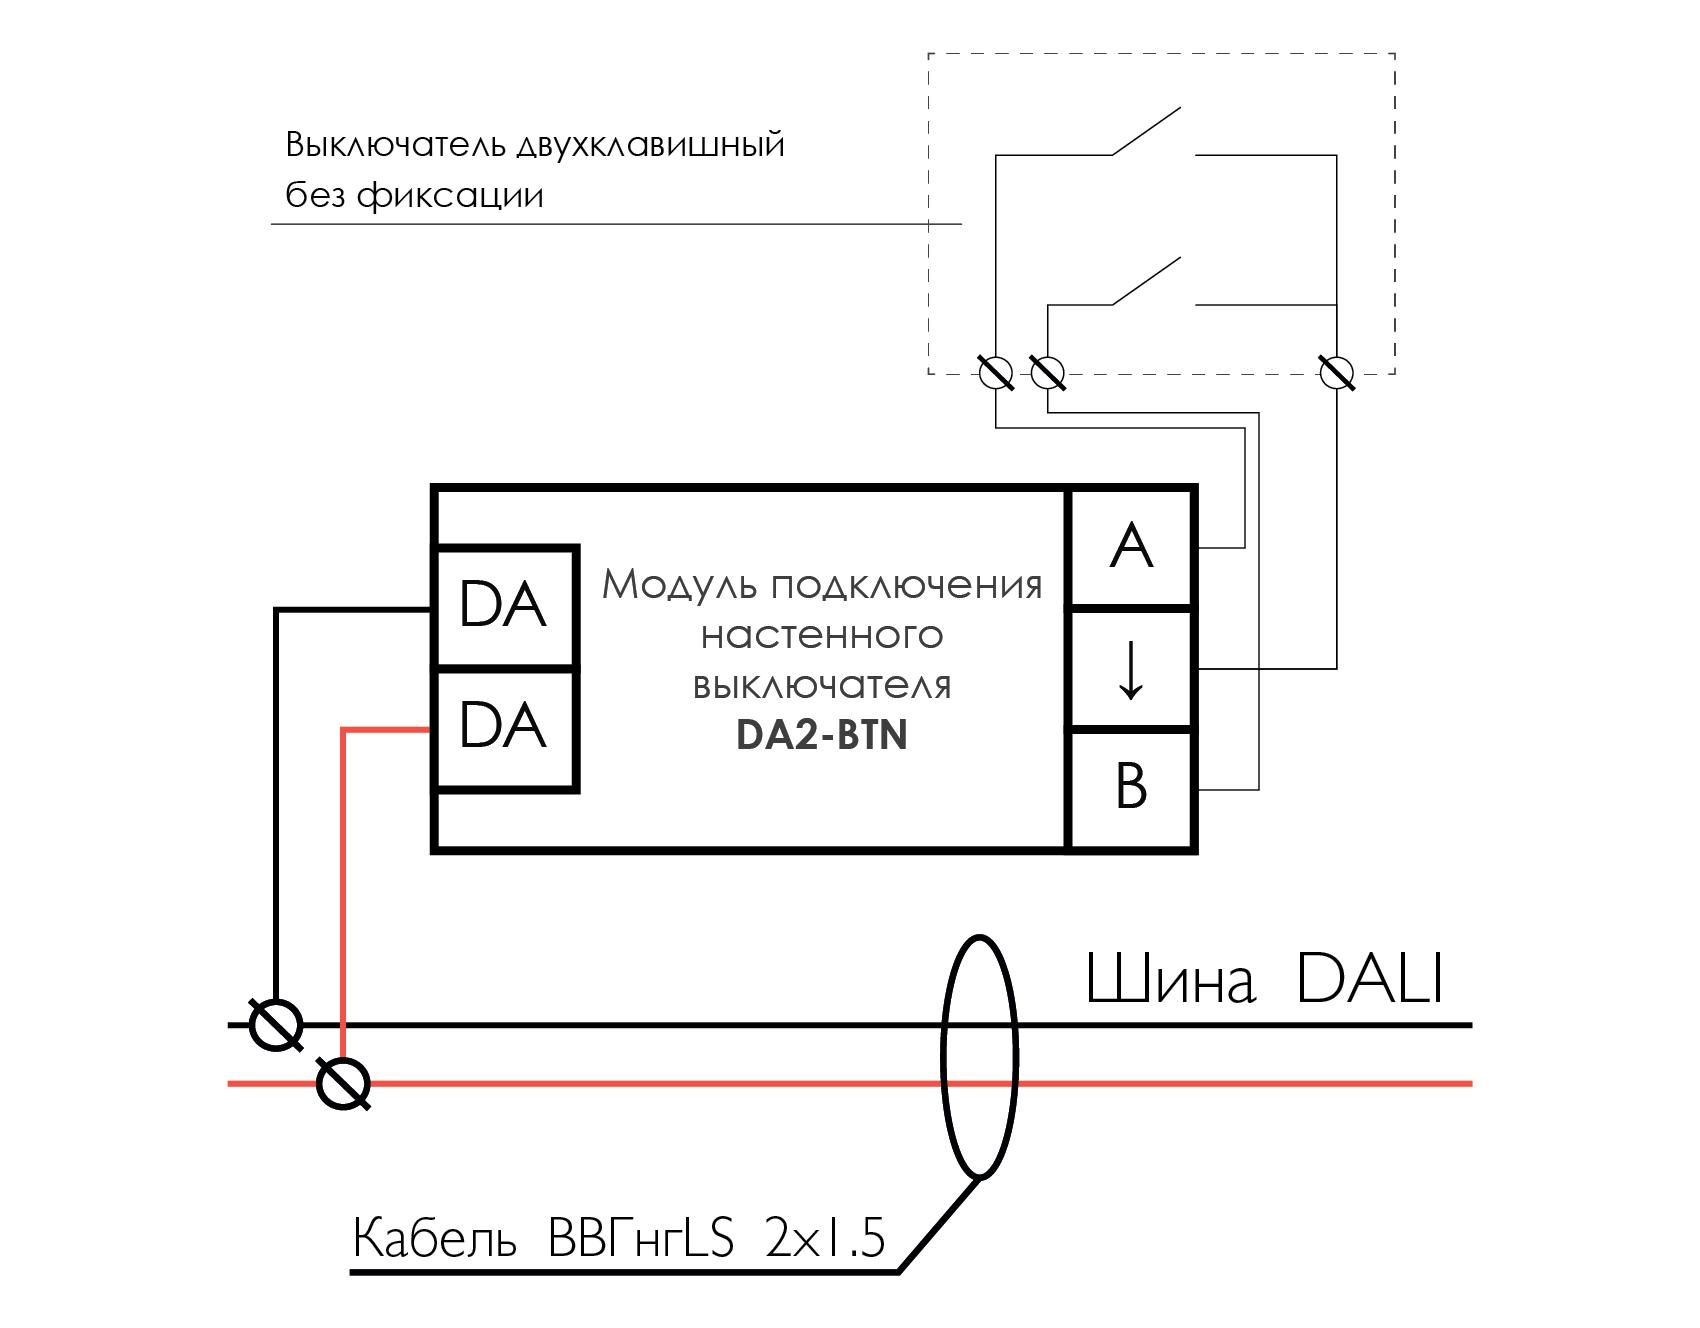 Схема подключения модуля DA2-BTN